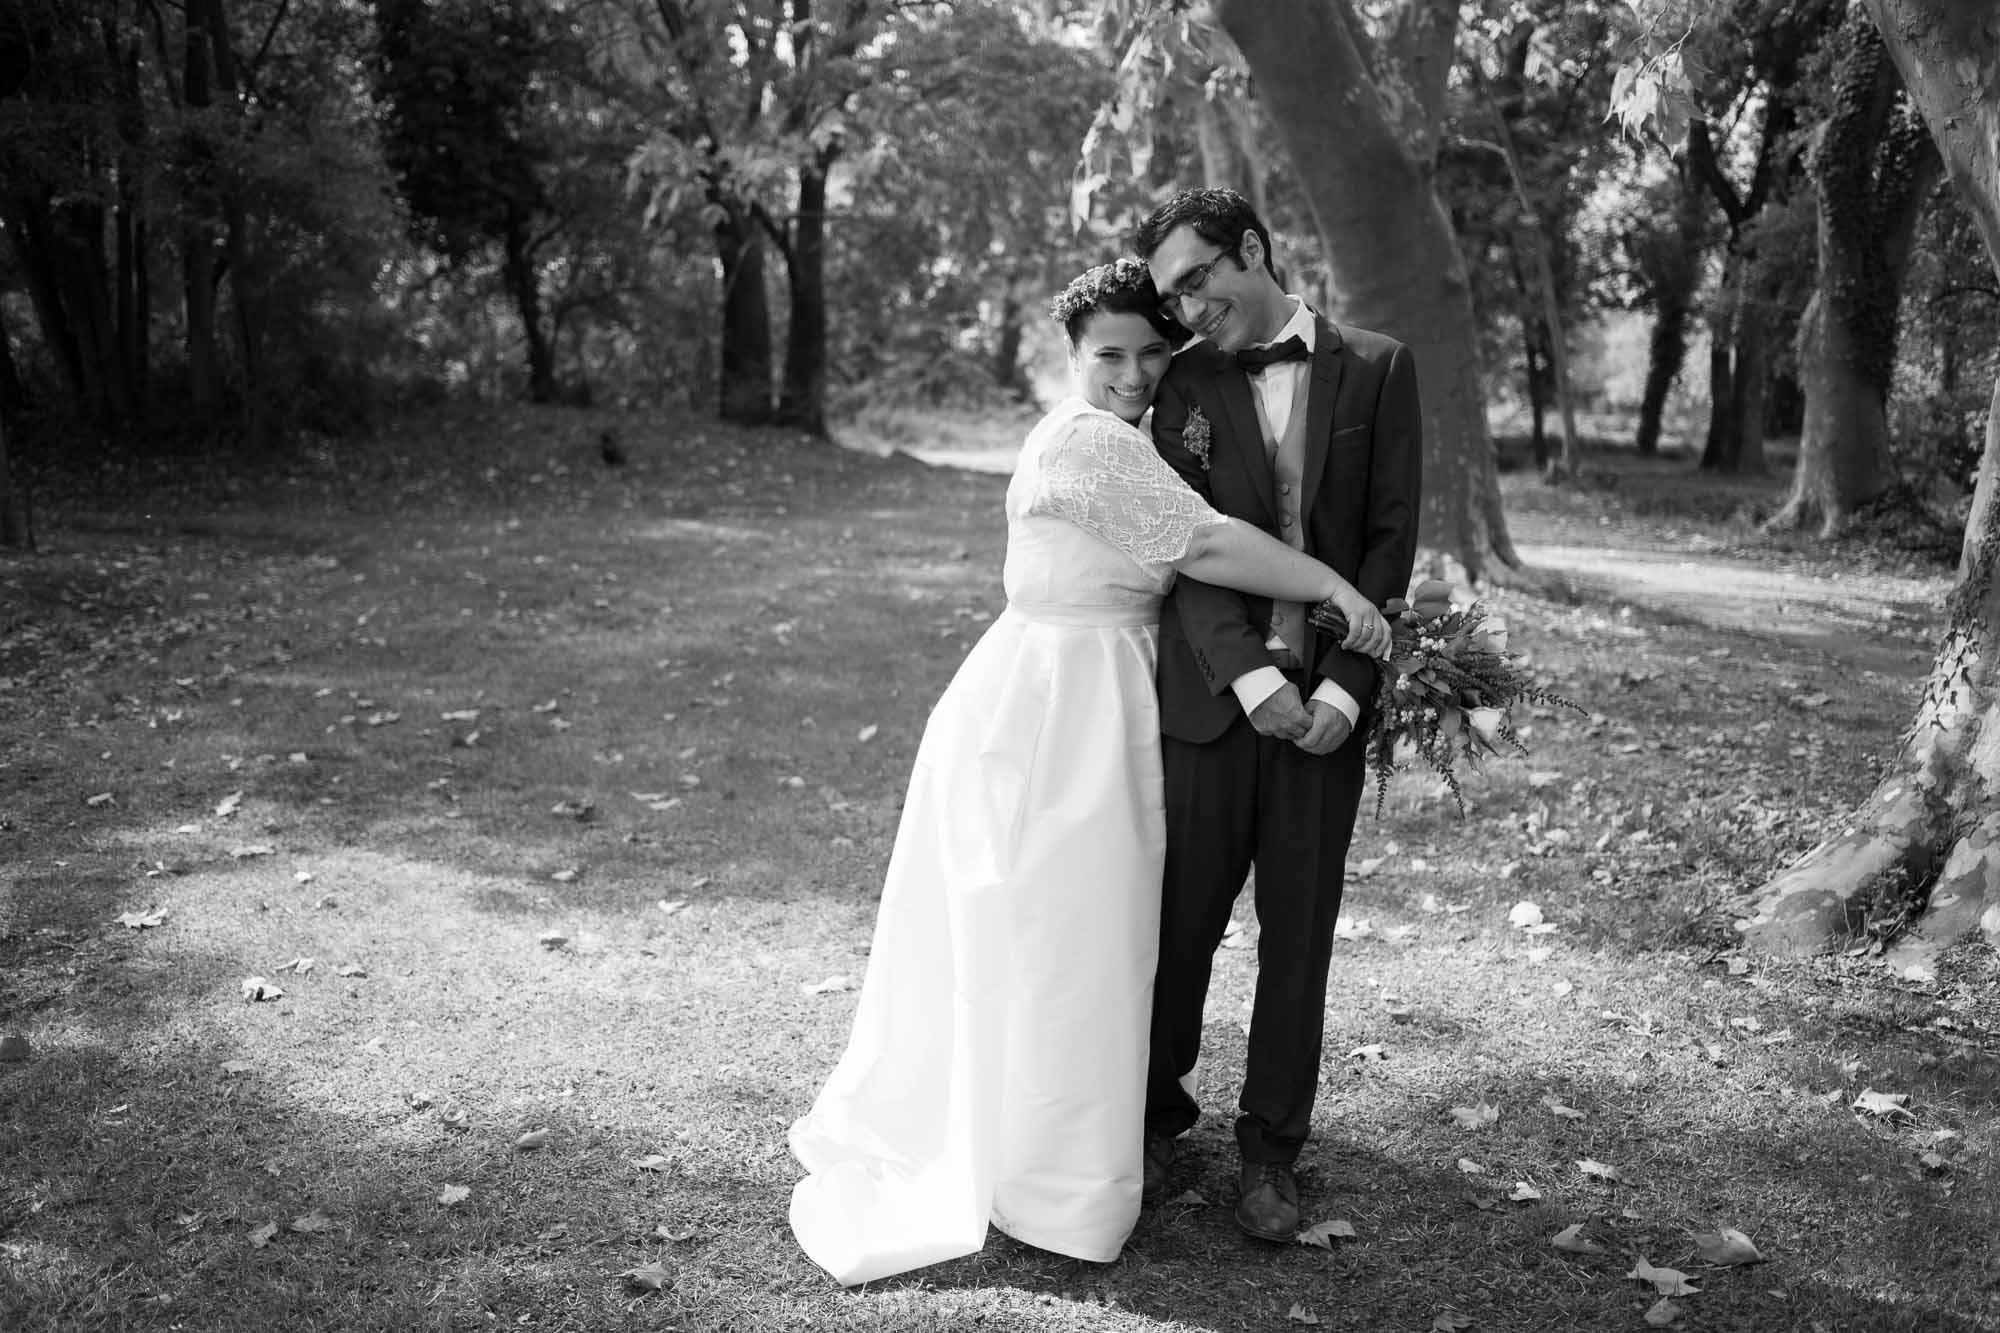 Photographe salon de provence good julio molina - Photographe mariage salon de provence ...